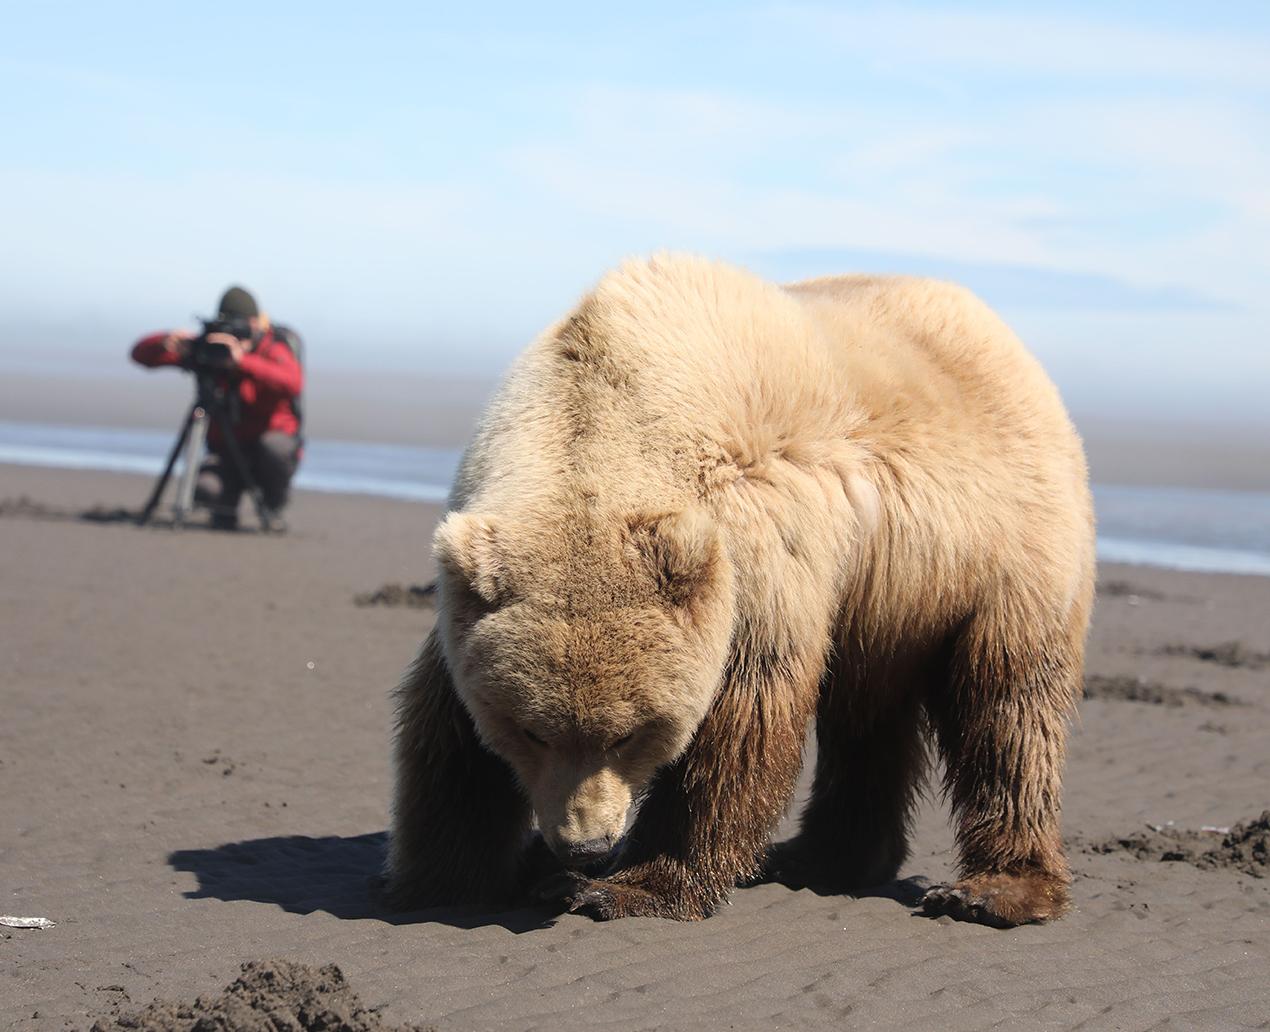 Auf Muschelsuche bei Ebbe, Lake Clark Nationalpark, Alaska 2018 © Lea Goldberg